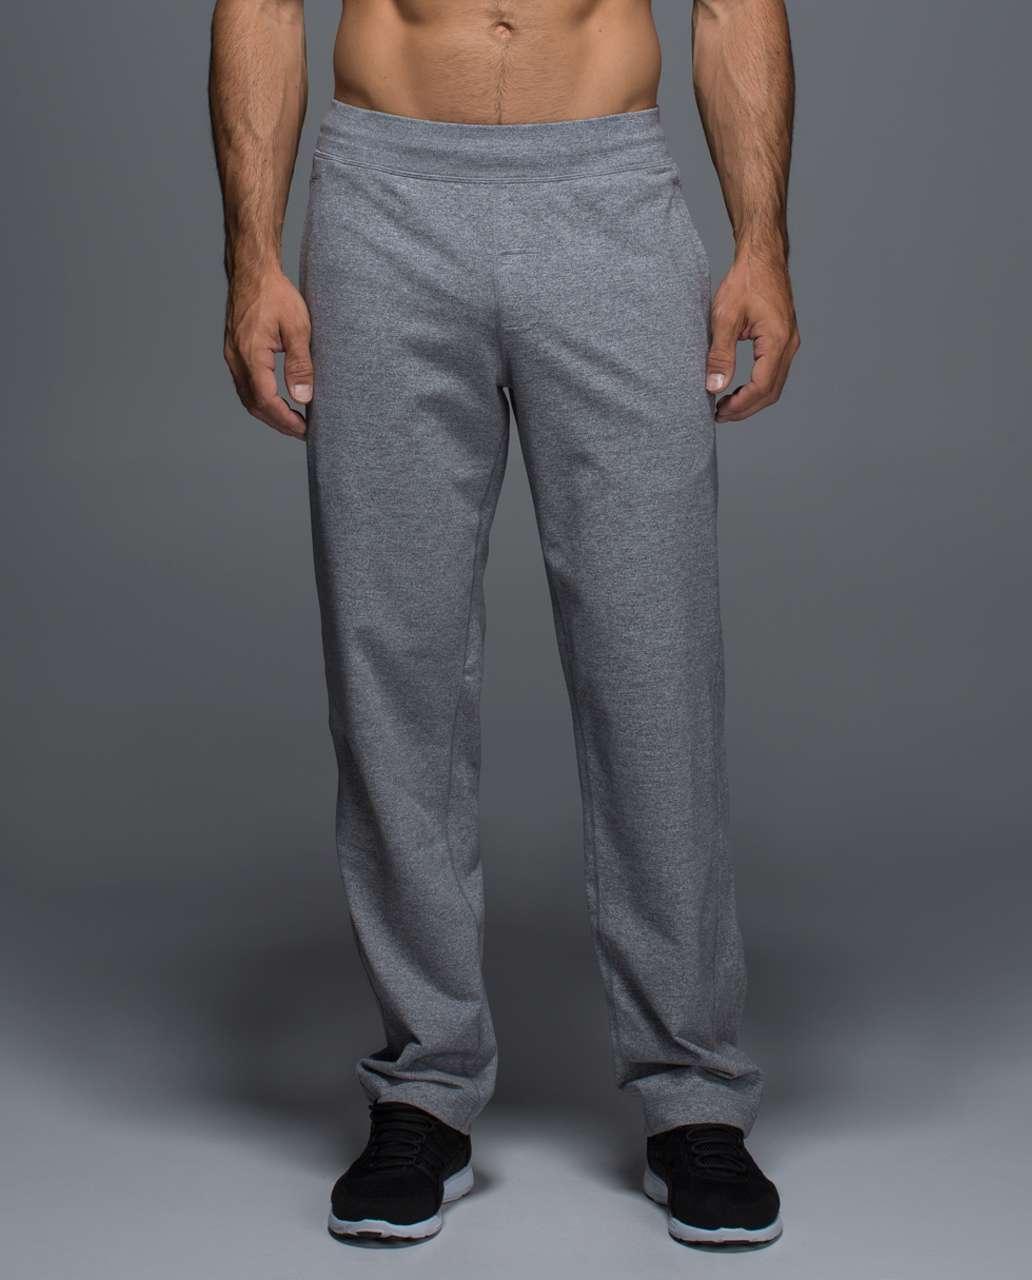 lululemon mens sweatpants